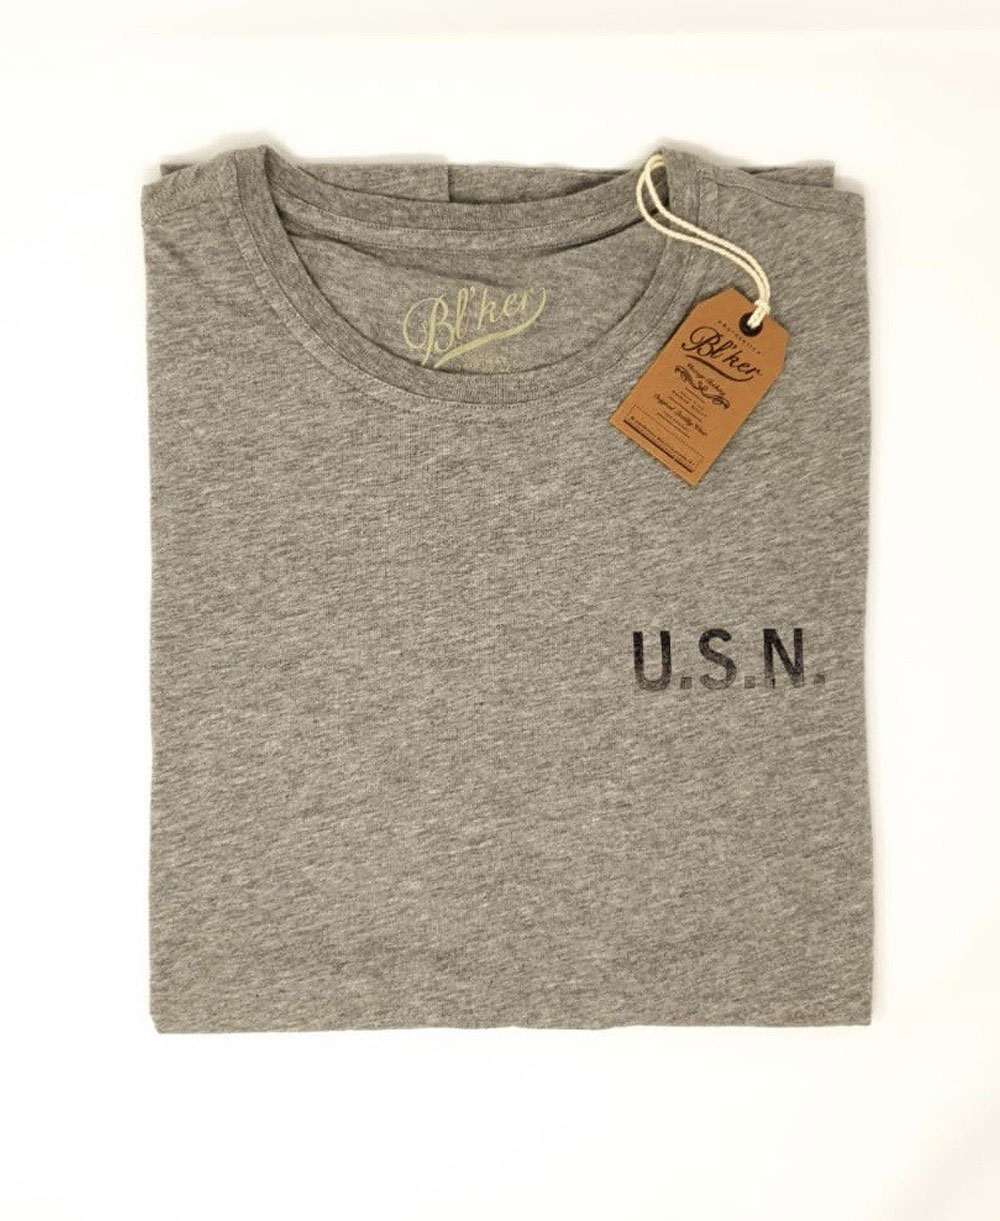 USN T-Shirt Manica Corta Uomo Heather Grey